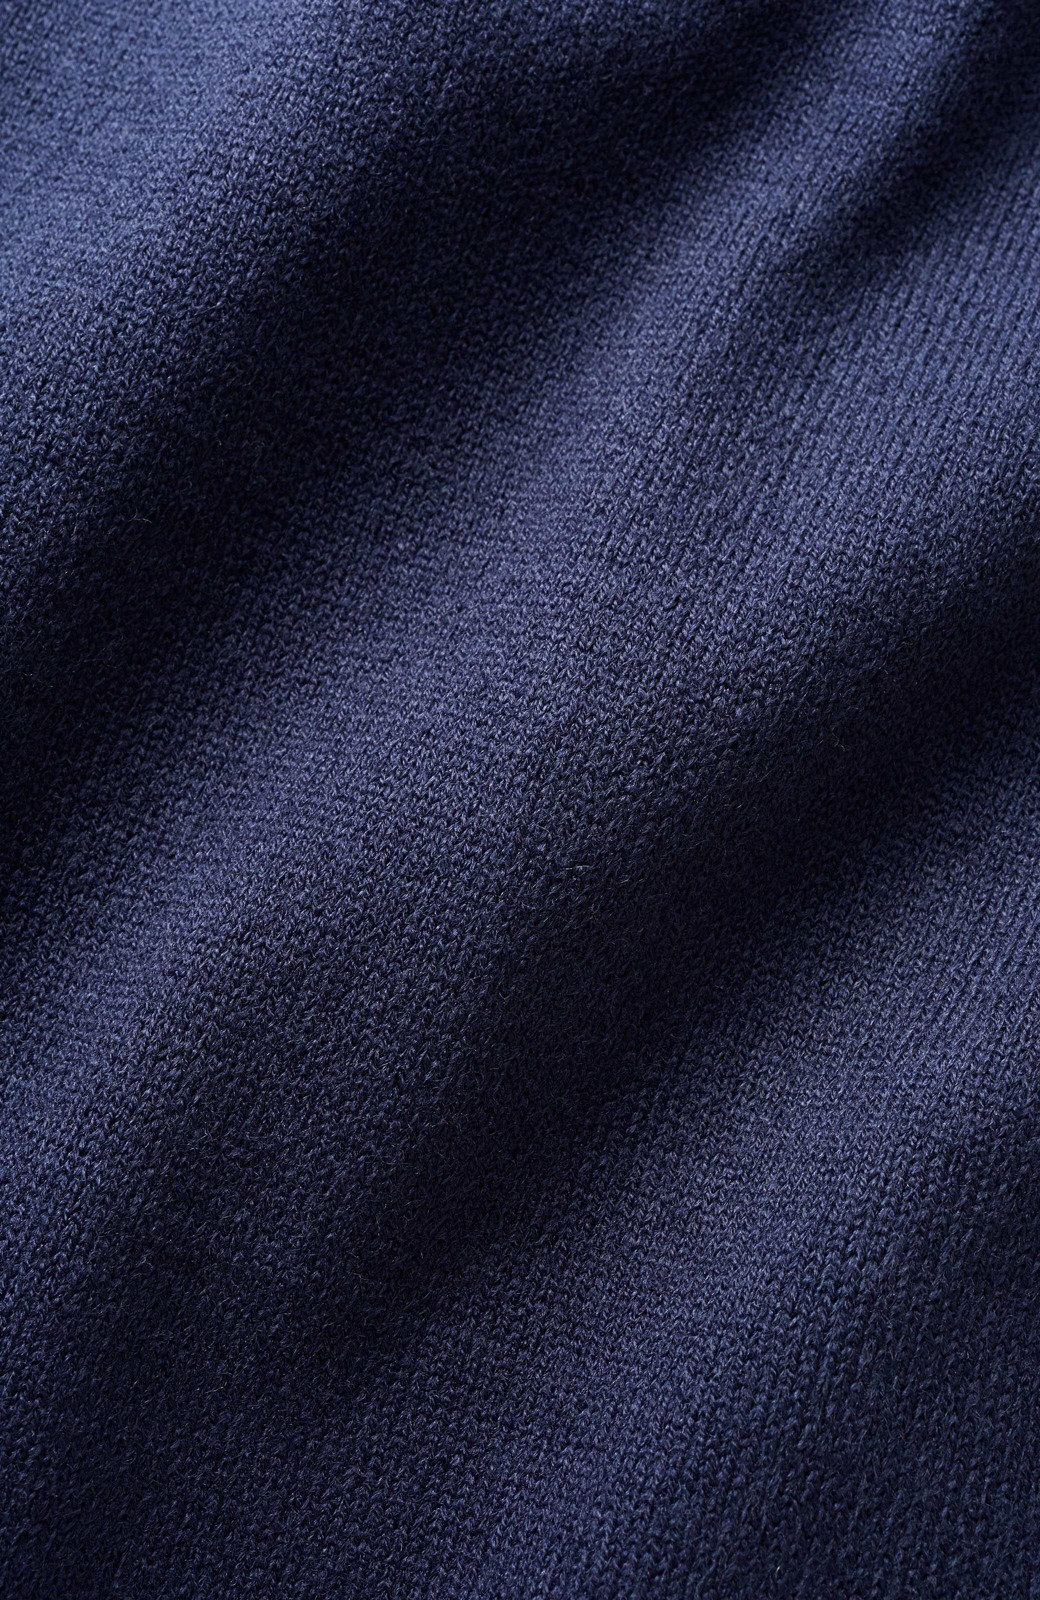 haco! 着こなし無限!自由自在なスリットロングニットとチェックプリーツスカートとチュール巻きスカートの3点セット <ネイビー>の商品写真5